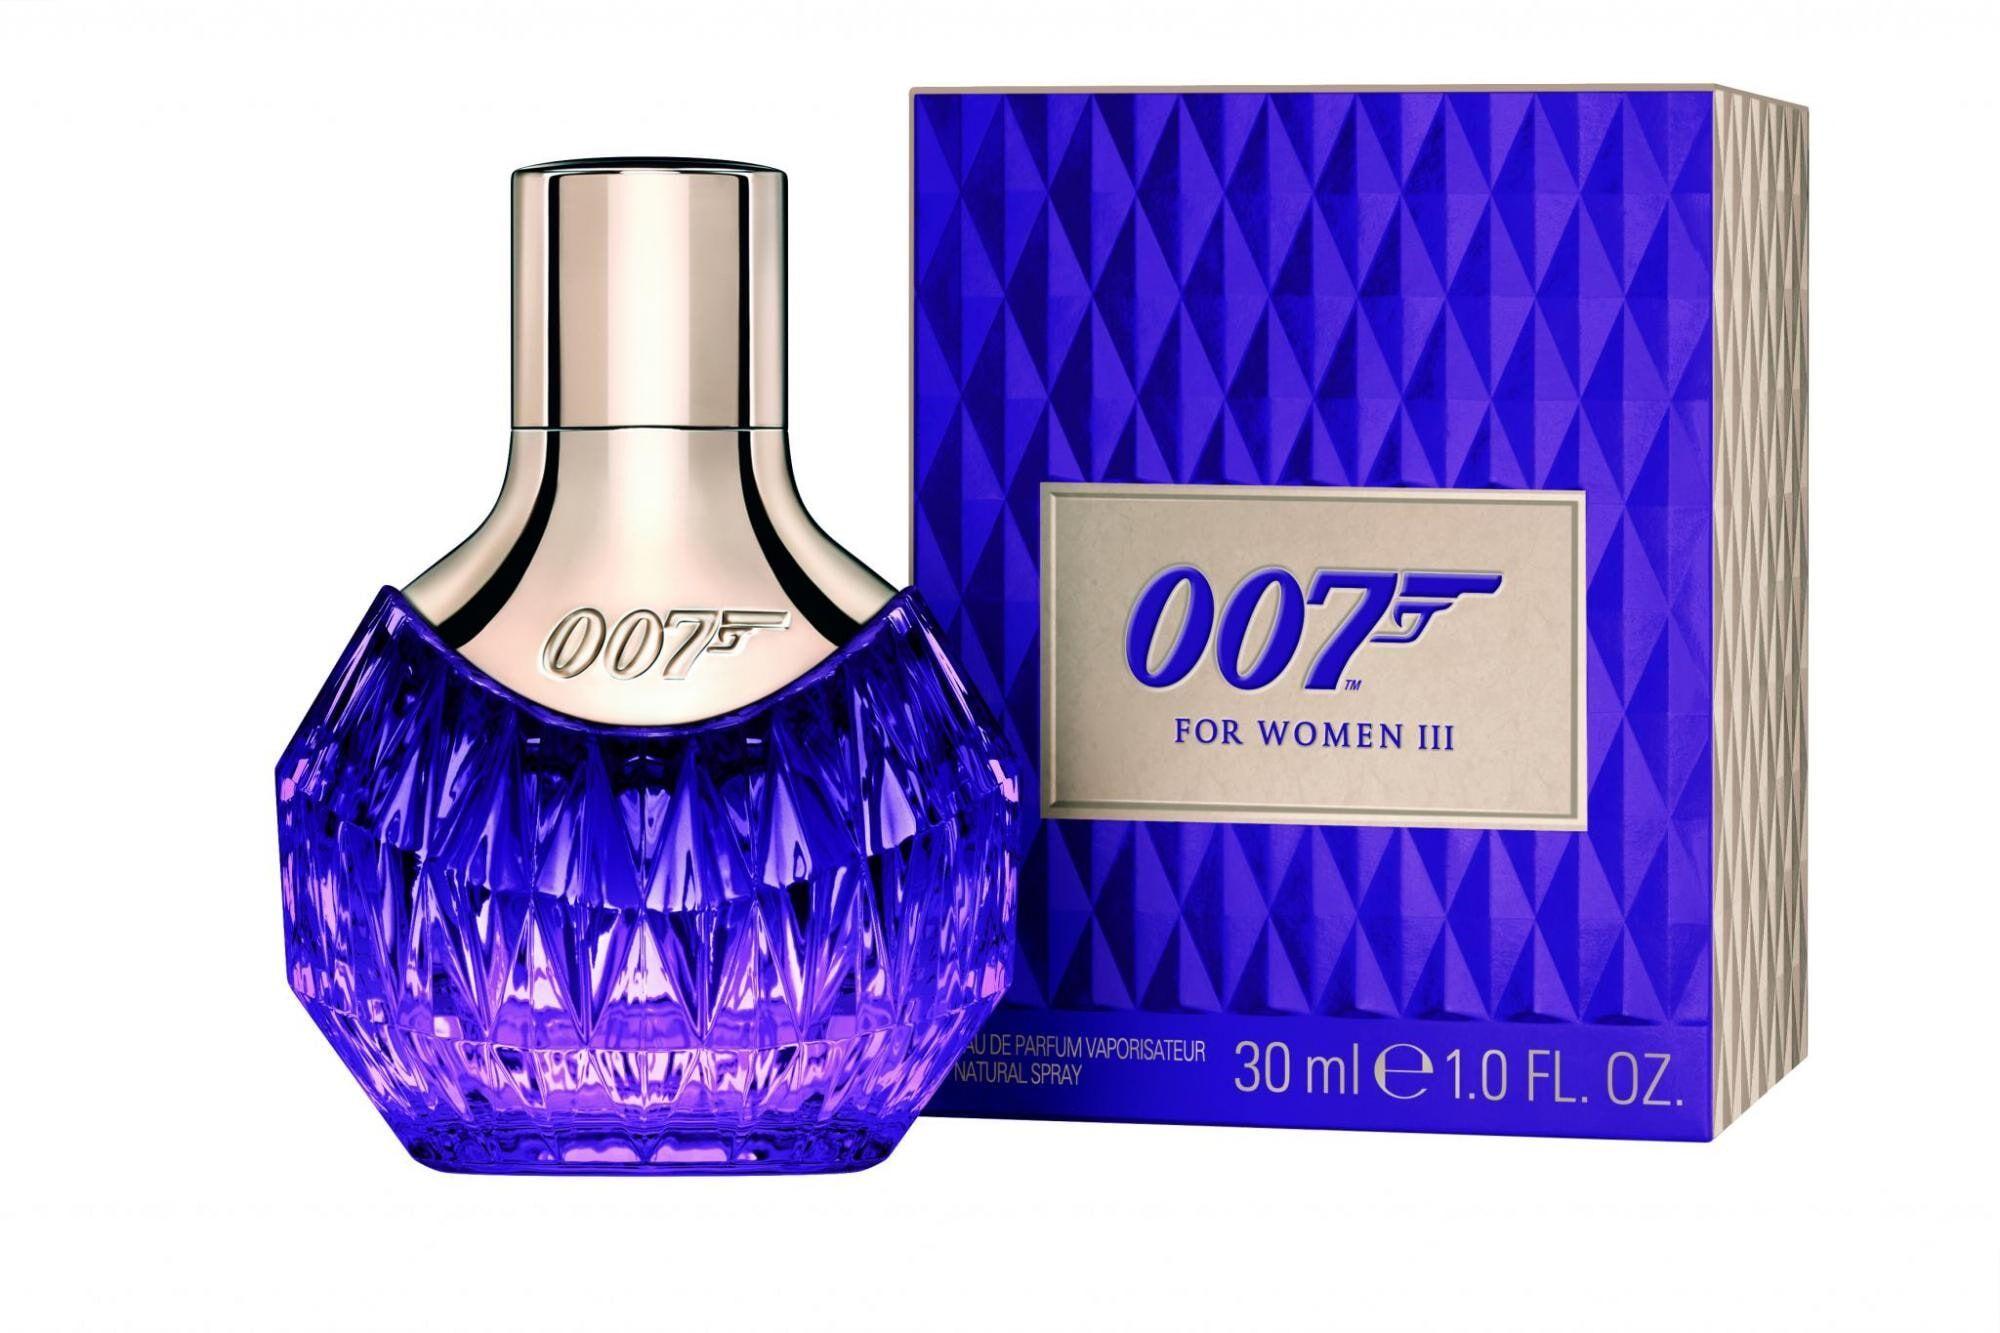 James Bond 007 For Women III 30 ml Edp naisten parfyymi